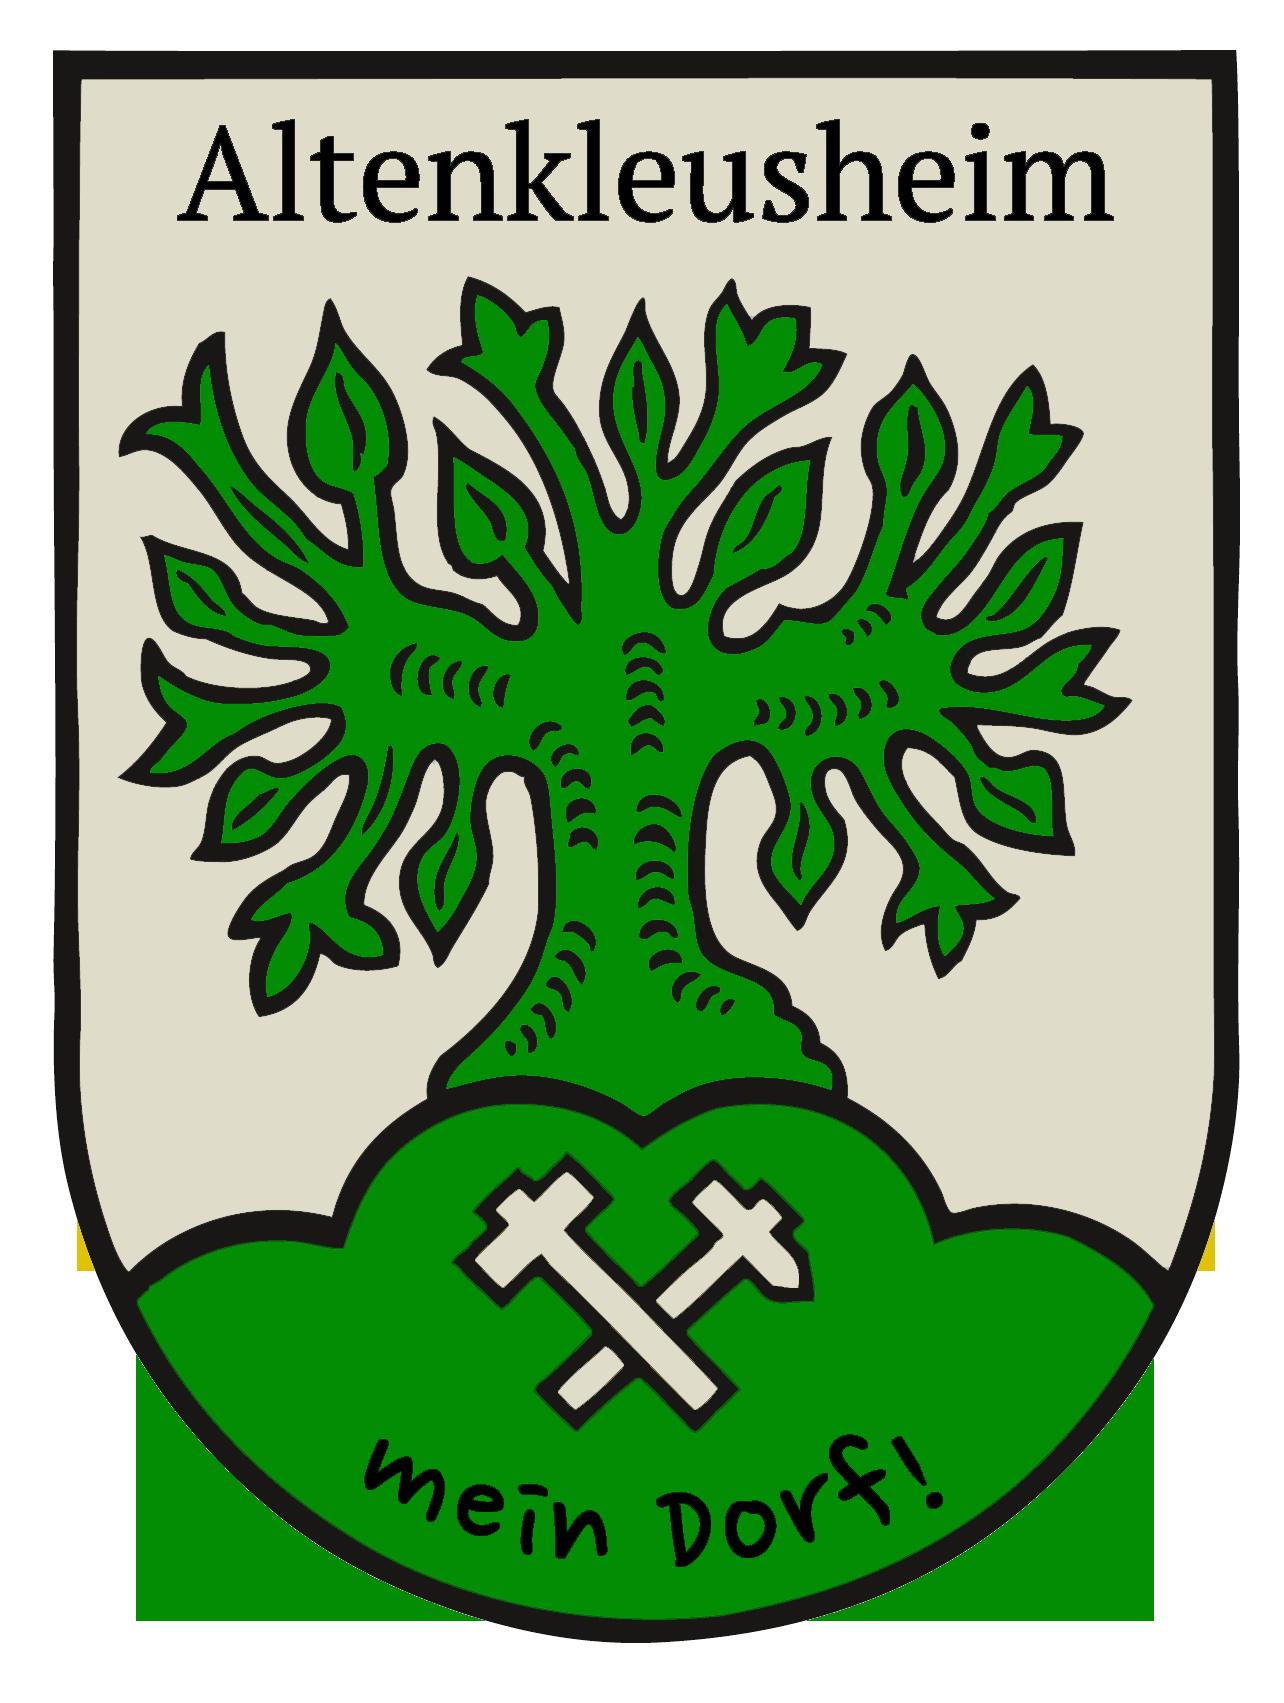 Altenkleusheim